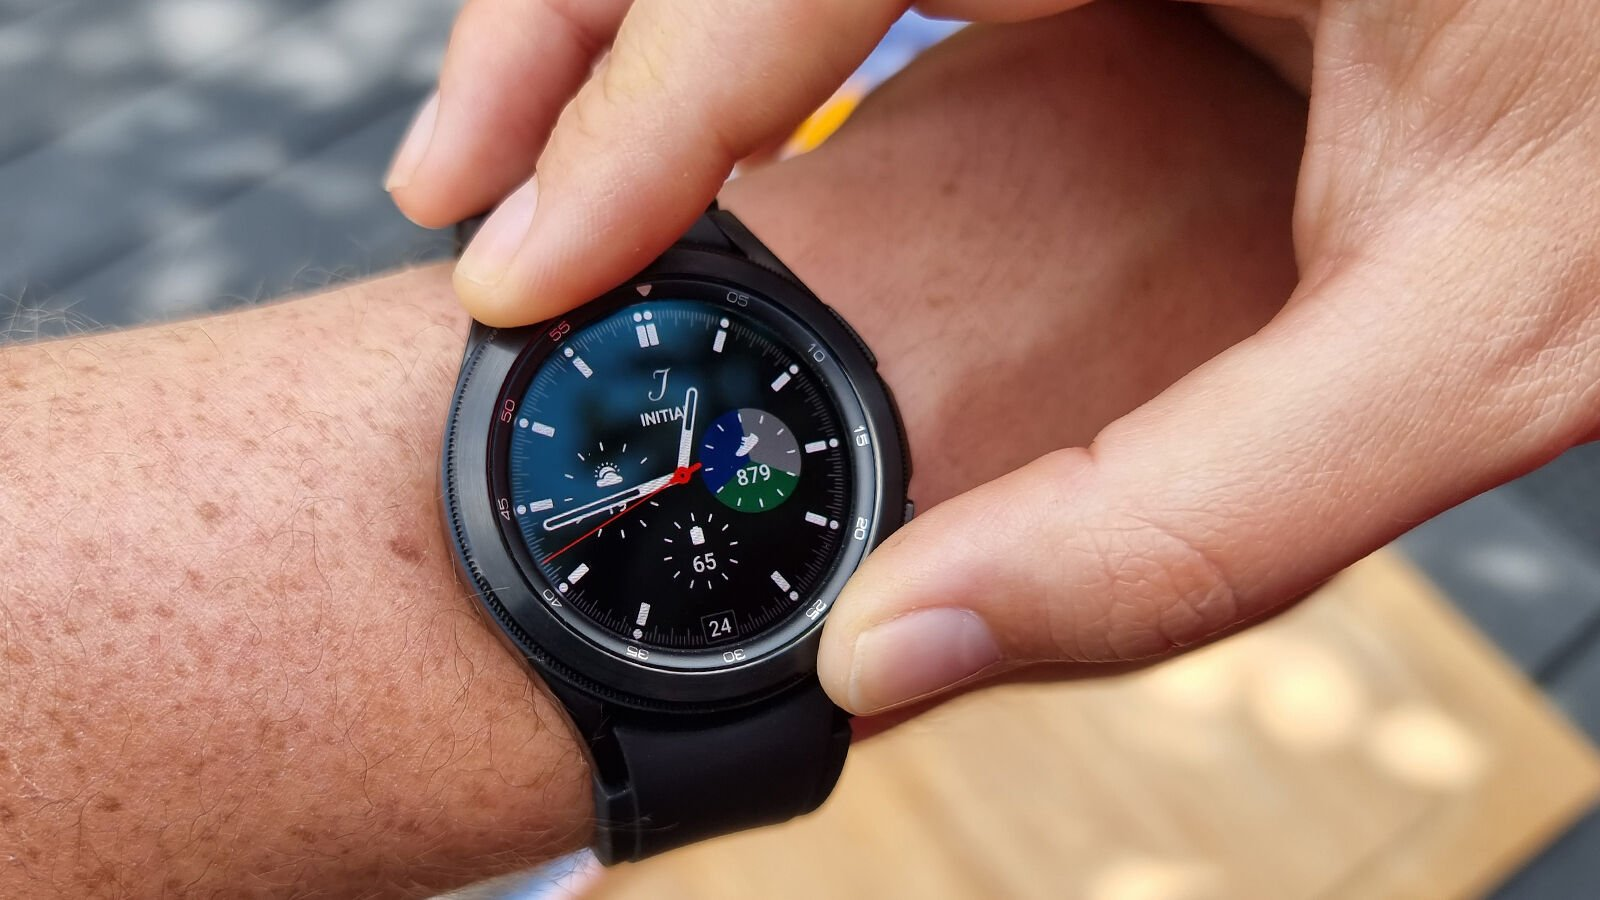 Samsung Galaxy Watch 4 Classic rotating bezel watch face